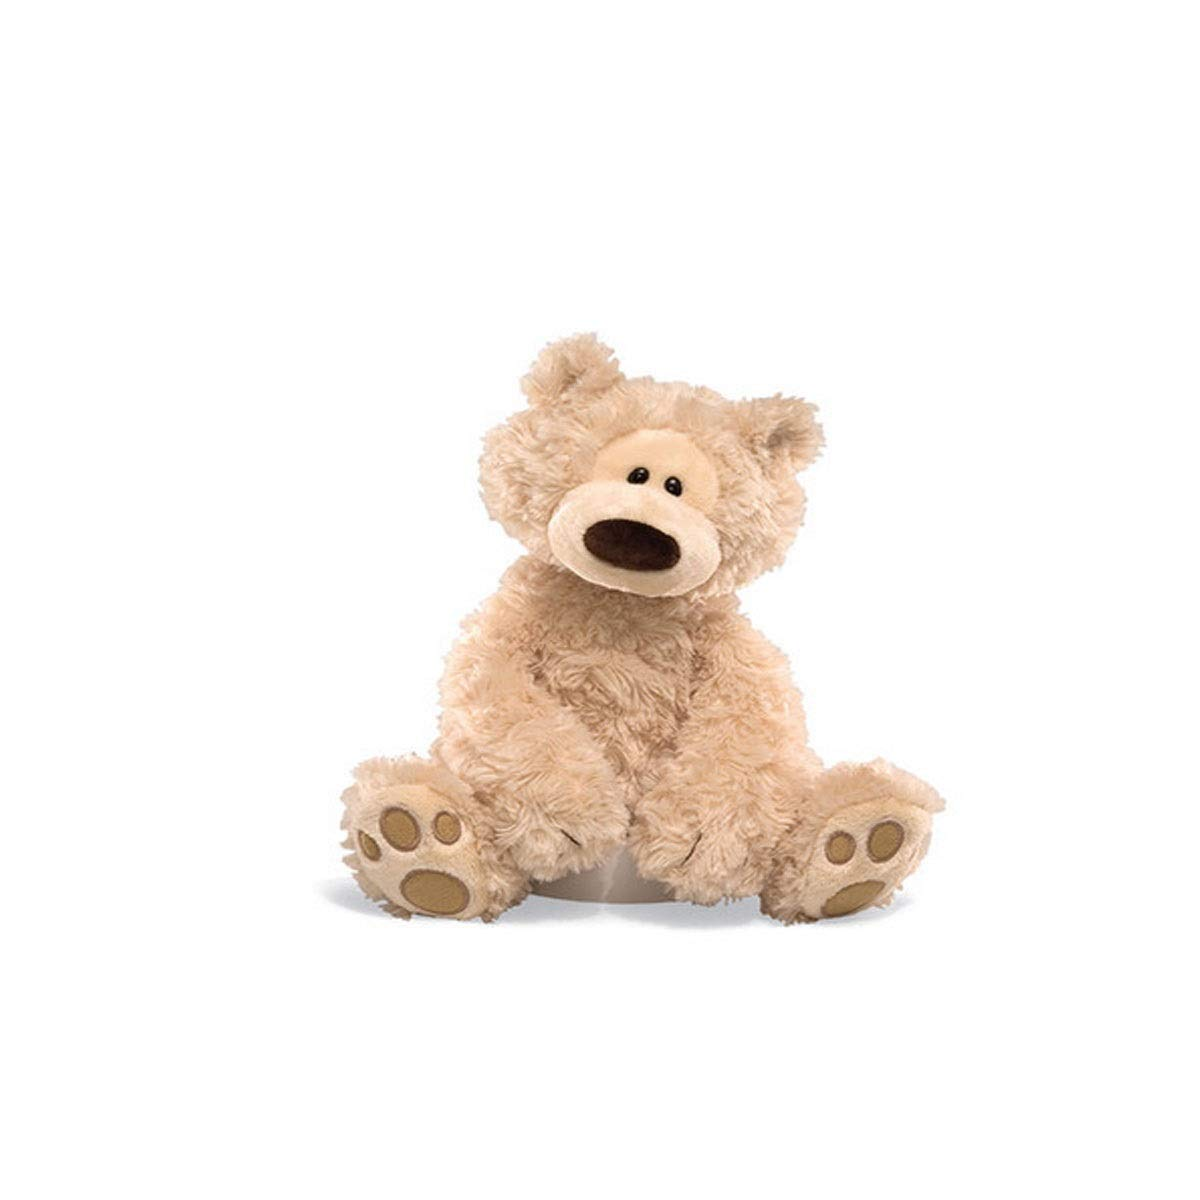 4674cmbeige feibinbin bear Shengshihuizhong Ke Huitong All Kinds of Plush Toys, Indigo Bear, Beige Bear, Koala, Polar Bear, Sleeping Bear, Etc, Bear Doll, Cloth Toy, Best Gift (Shape   3845cmbinqi Bear)